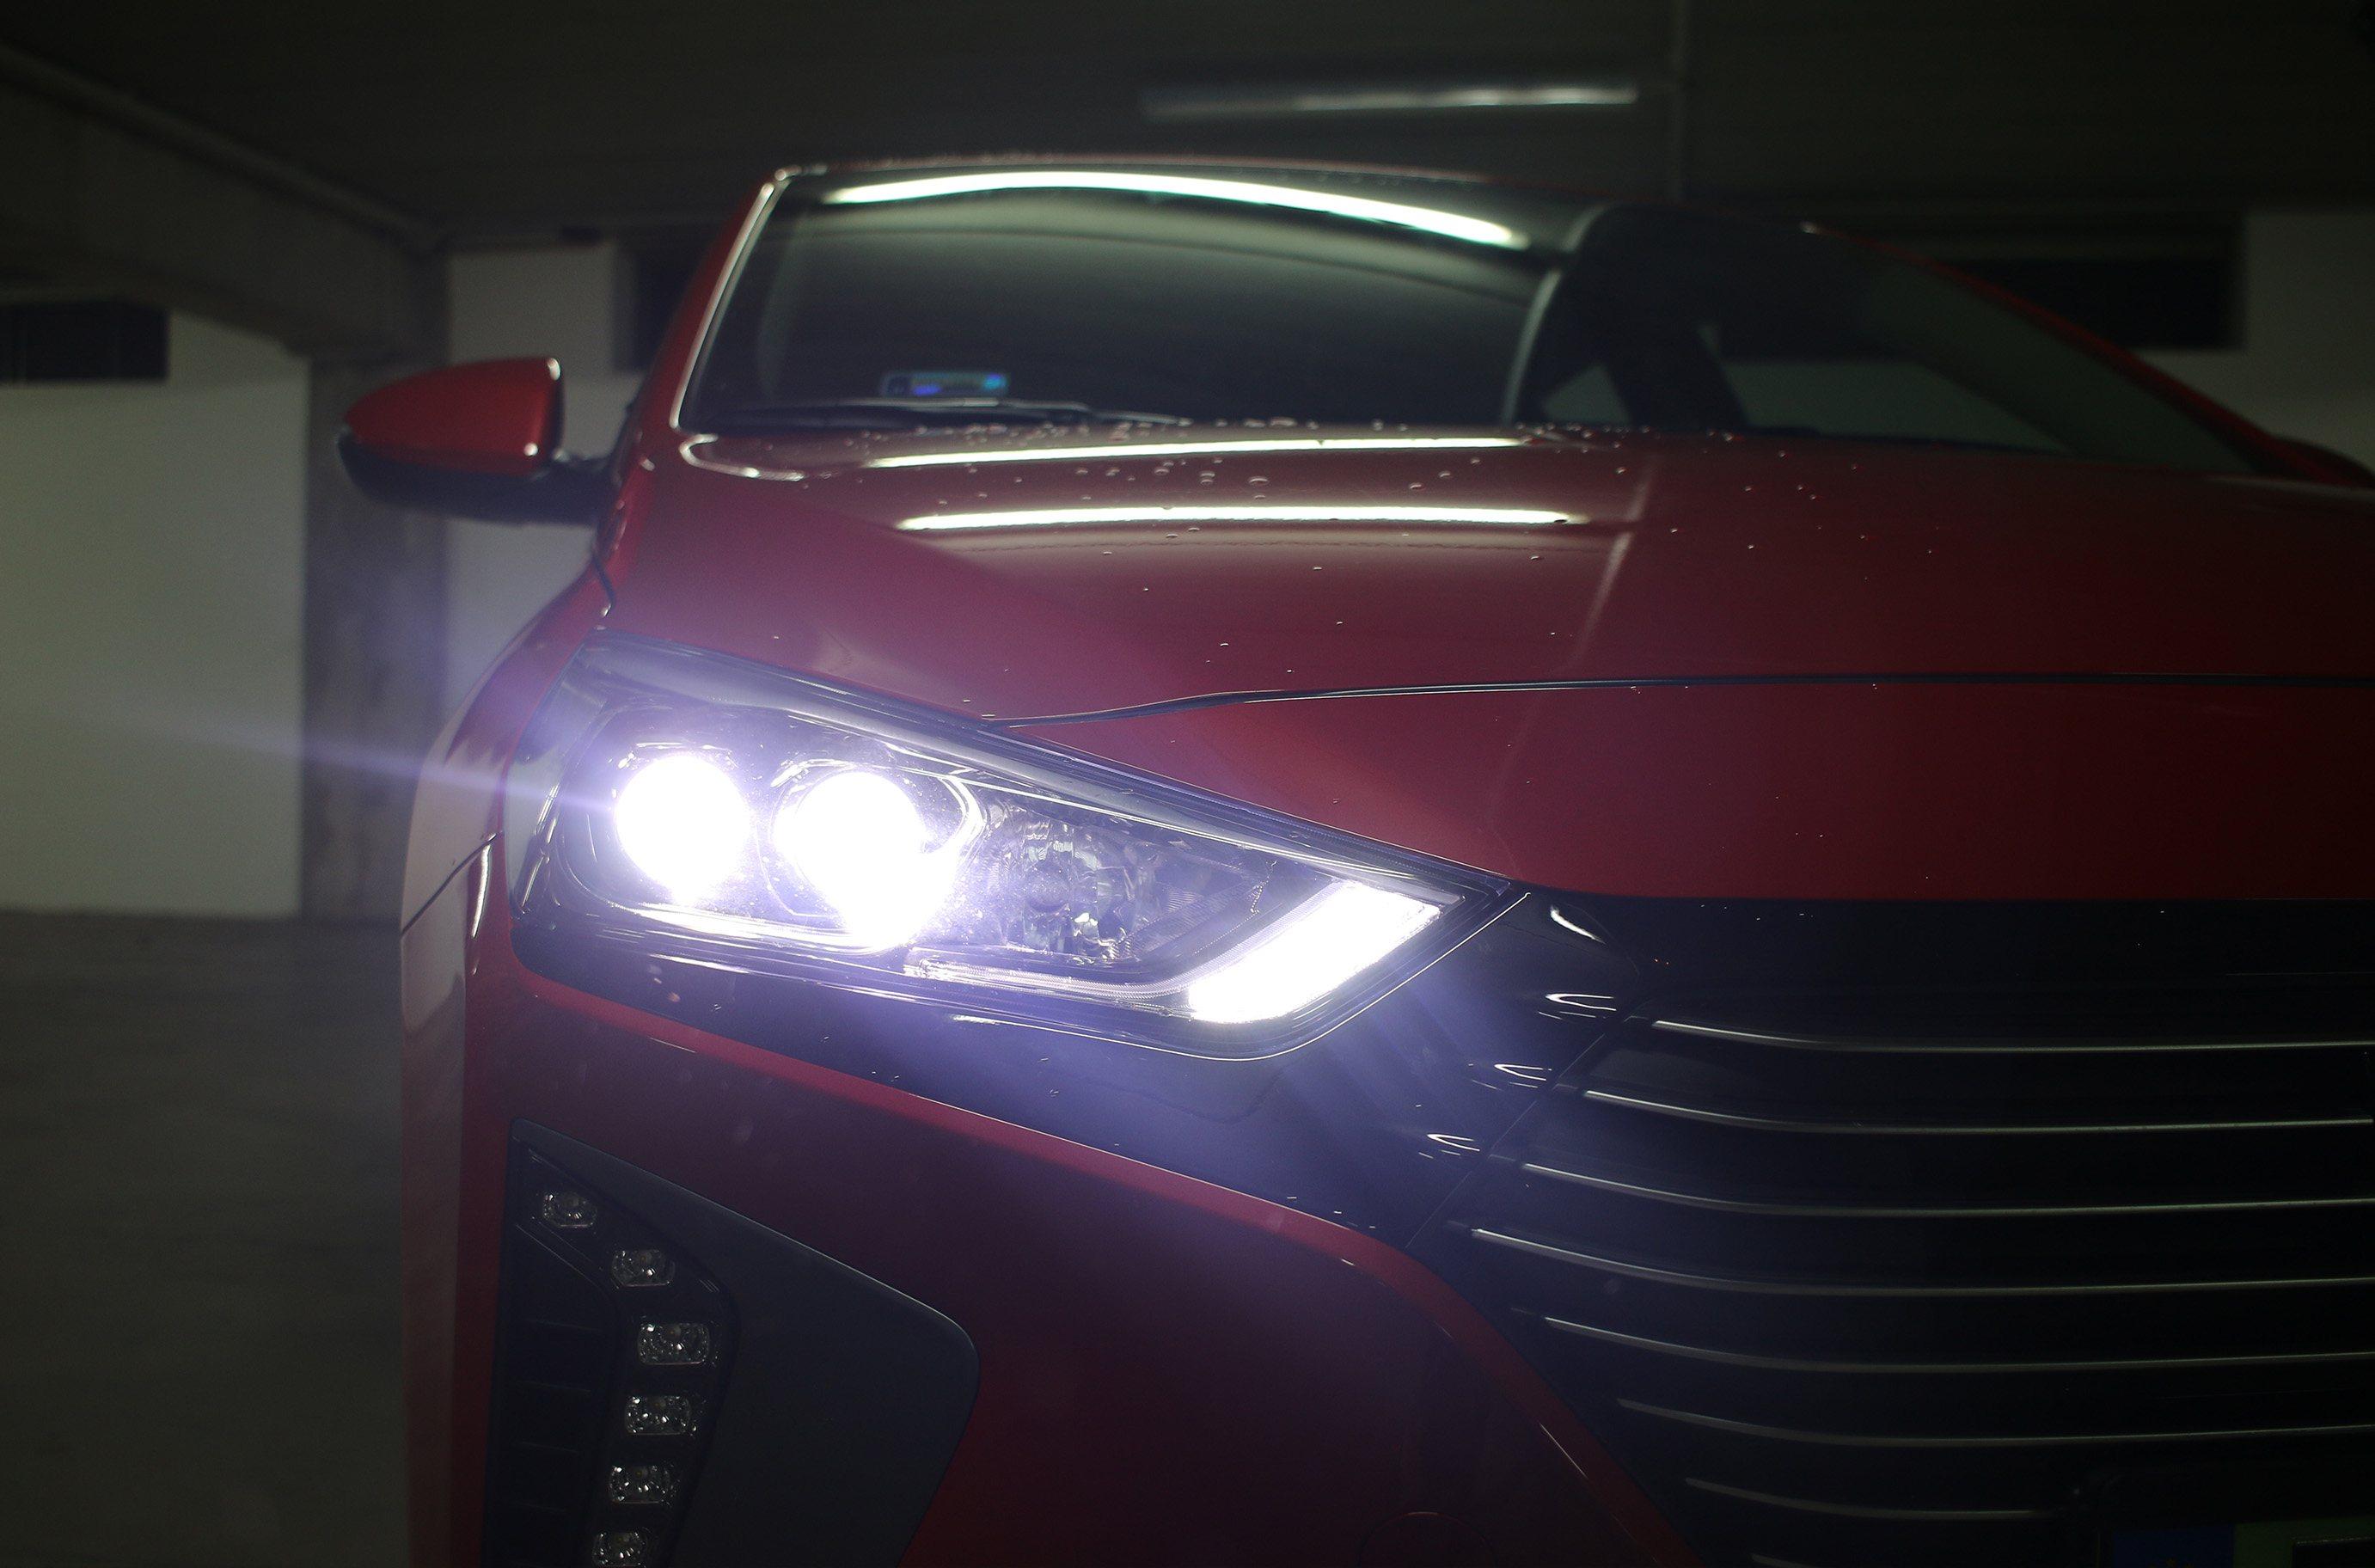 Hyundai_IONIQ_PHEV_test_6_zoldautok